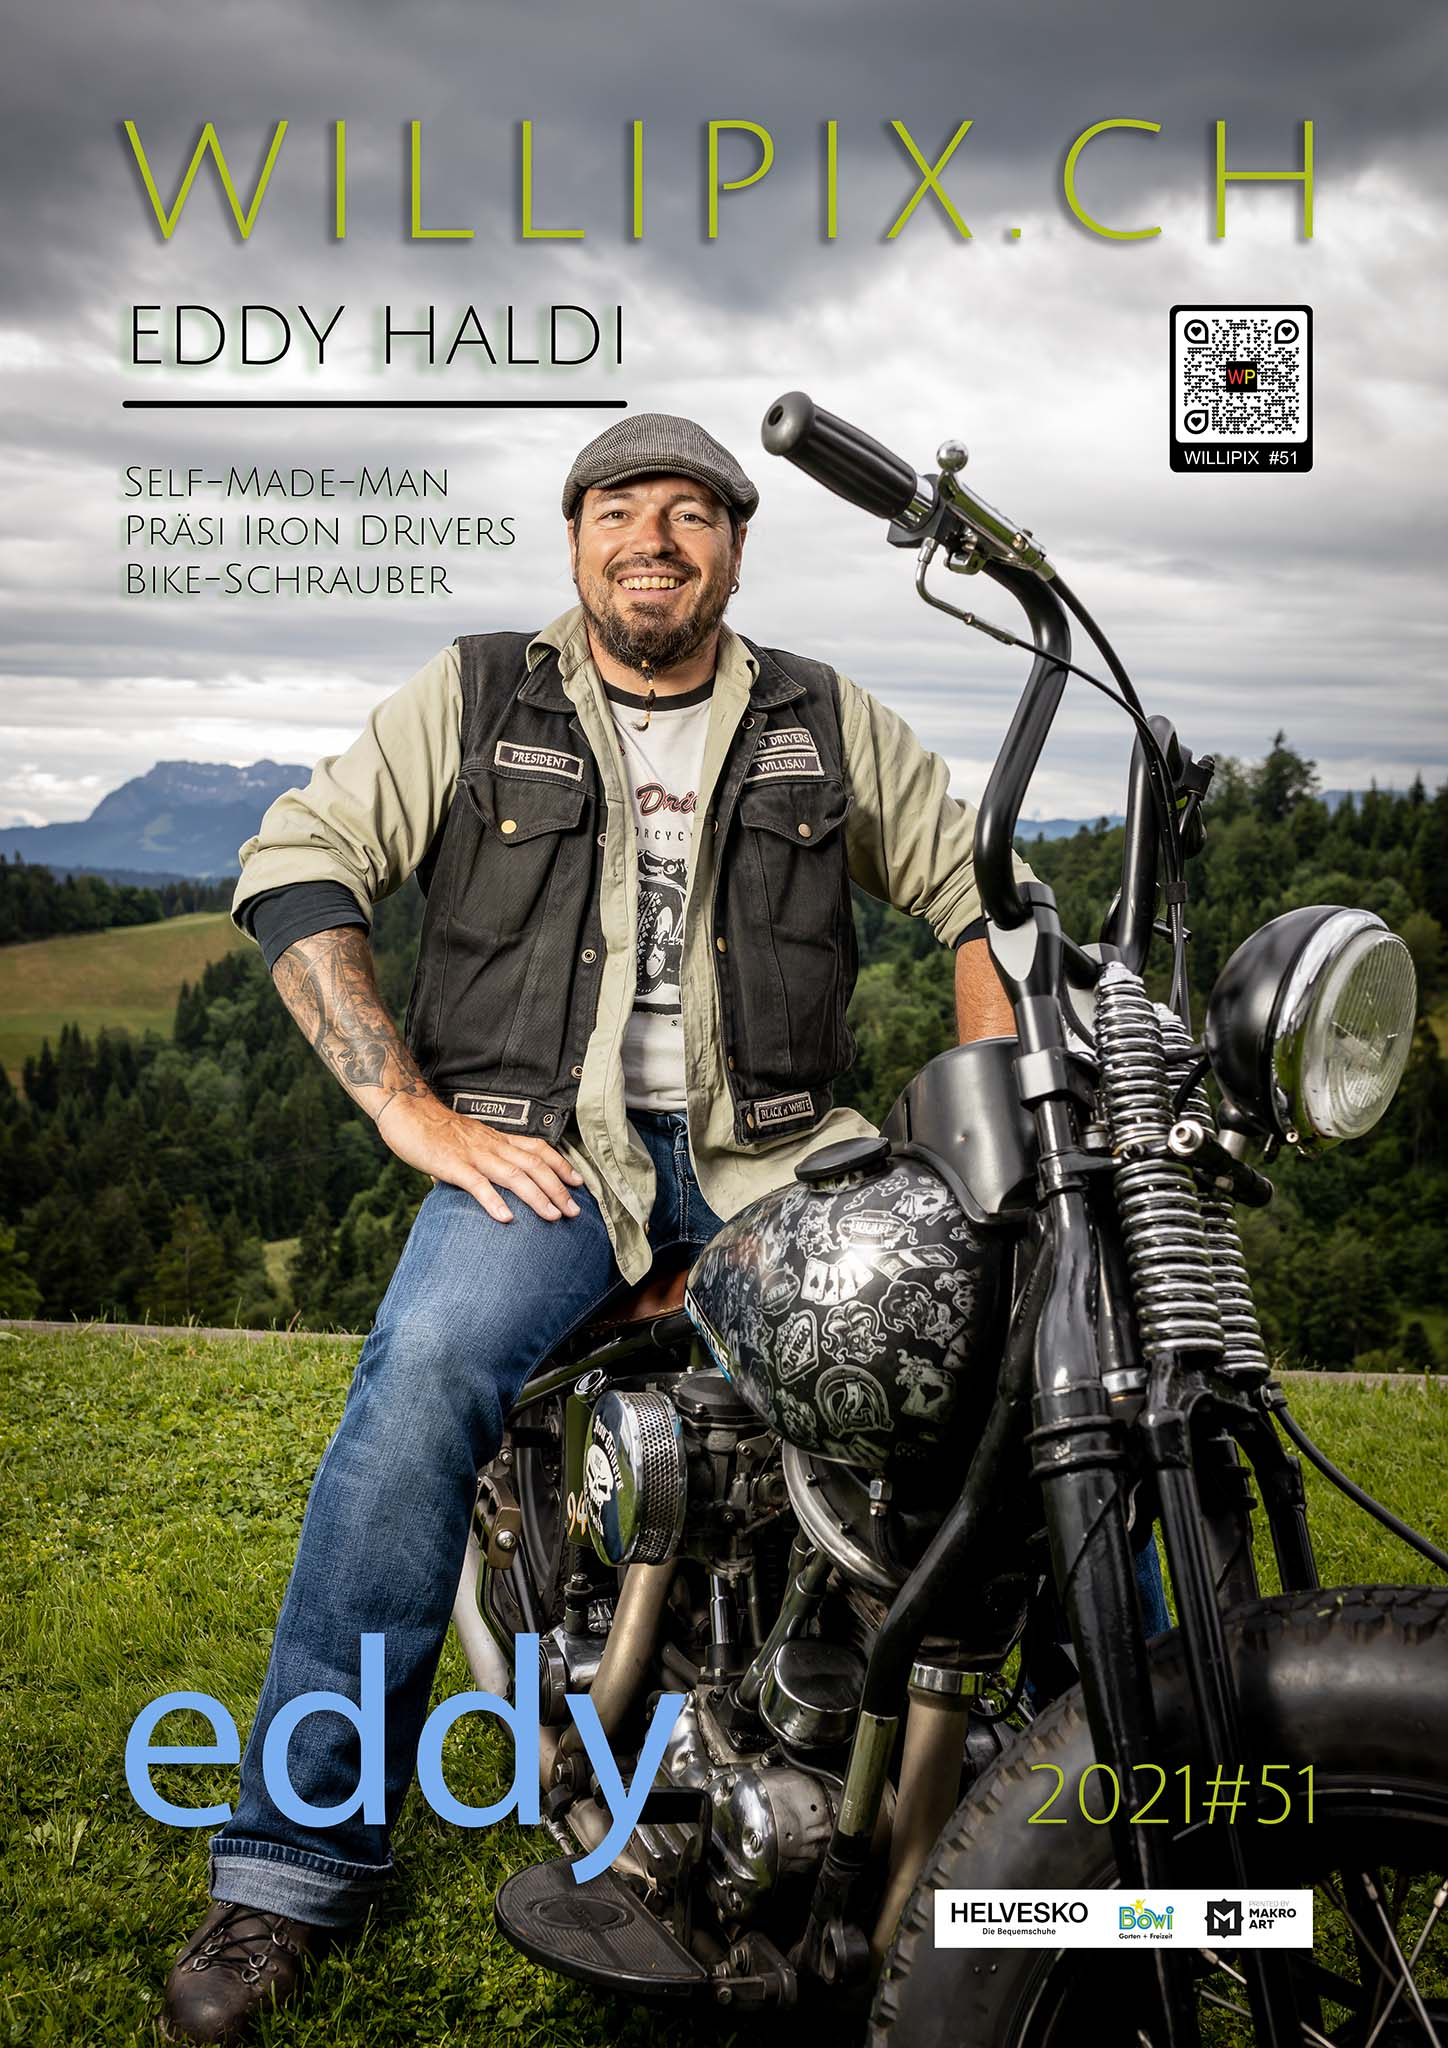 WILLIPIX-51: EDDY HALDI